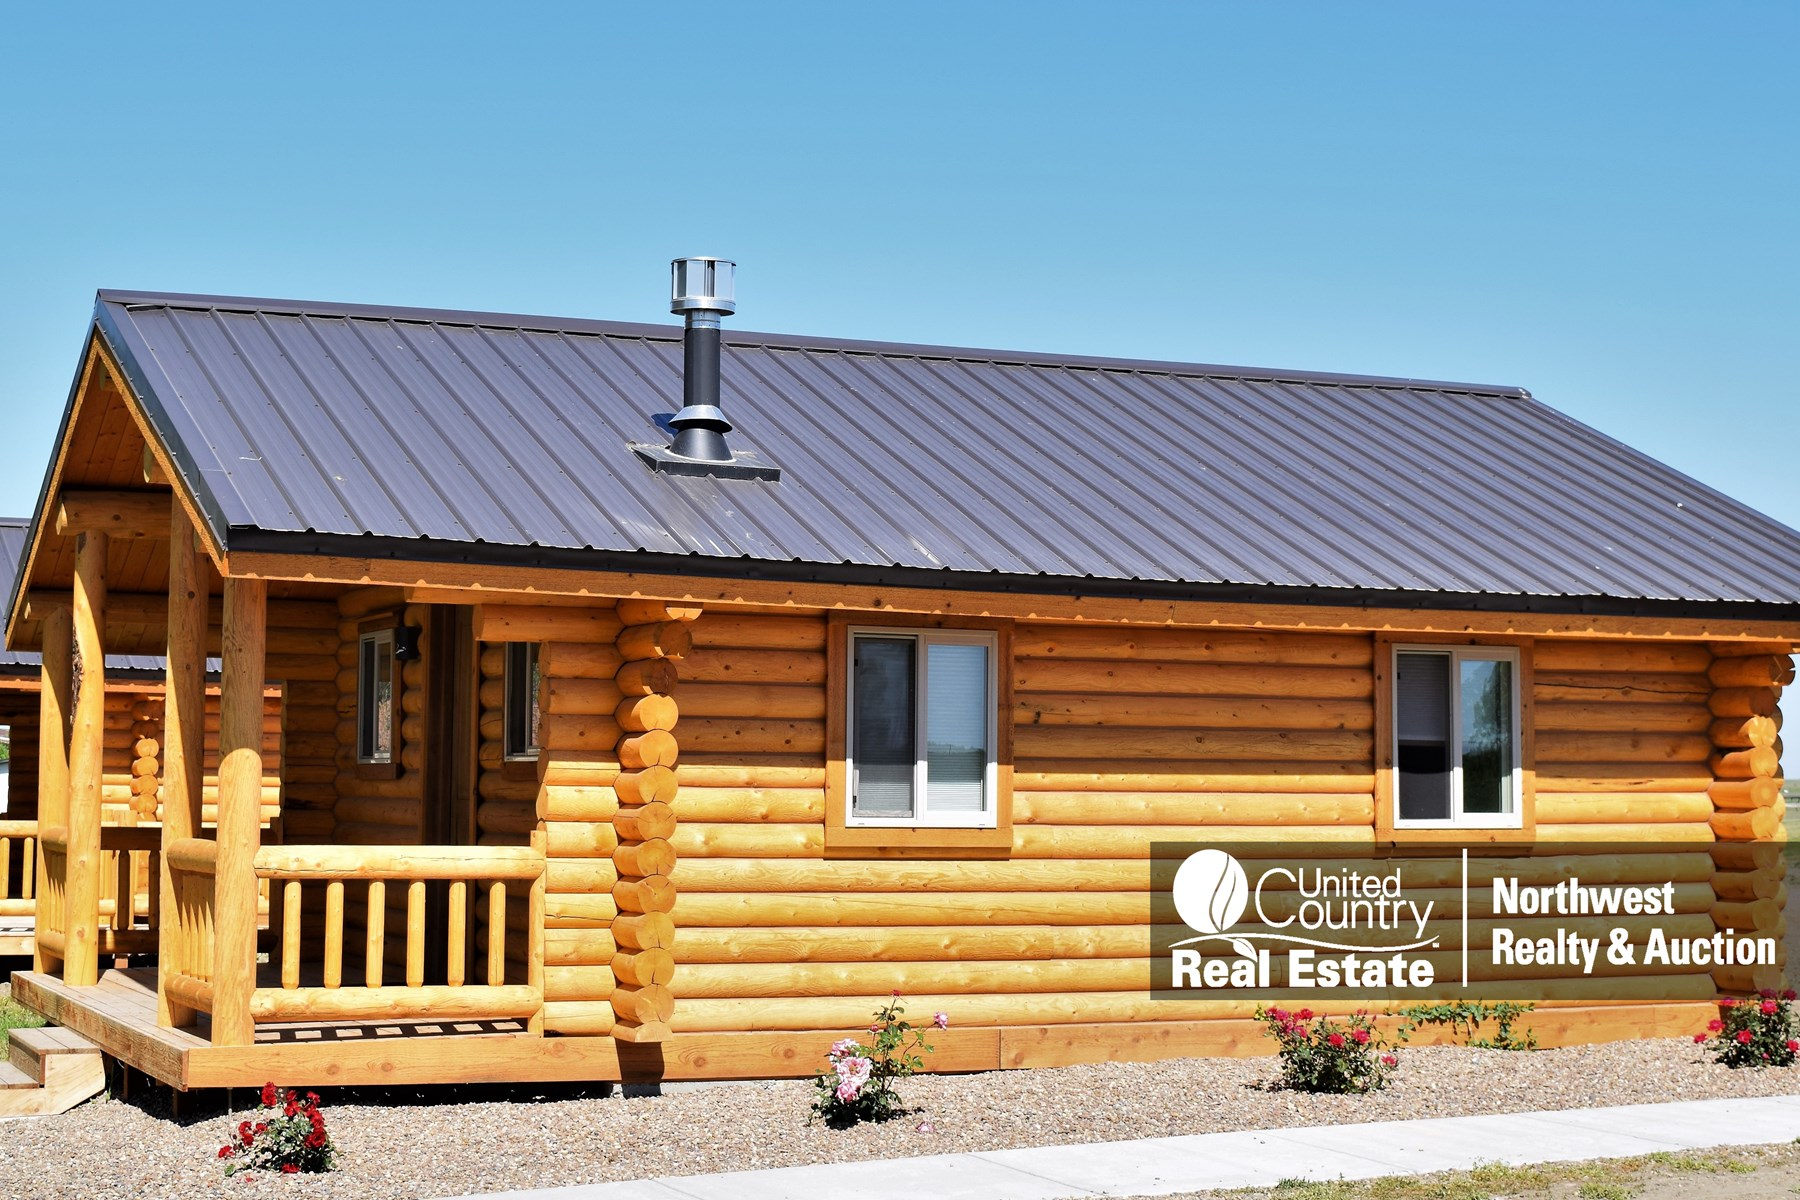 Sleeping Buffalo Resort - Cabin #4 Natural Hot Springs